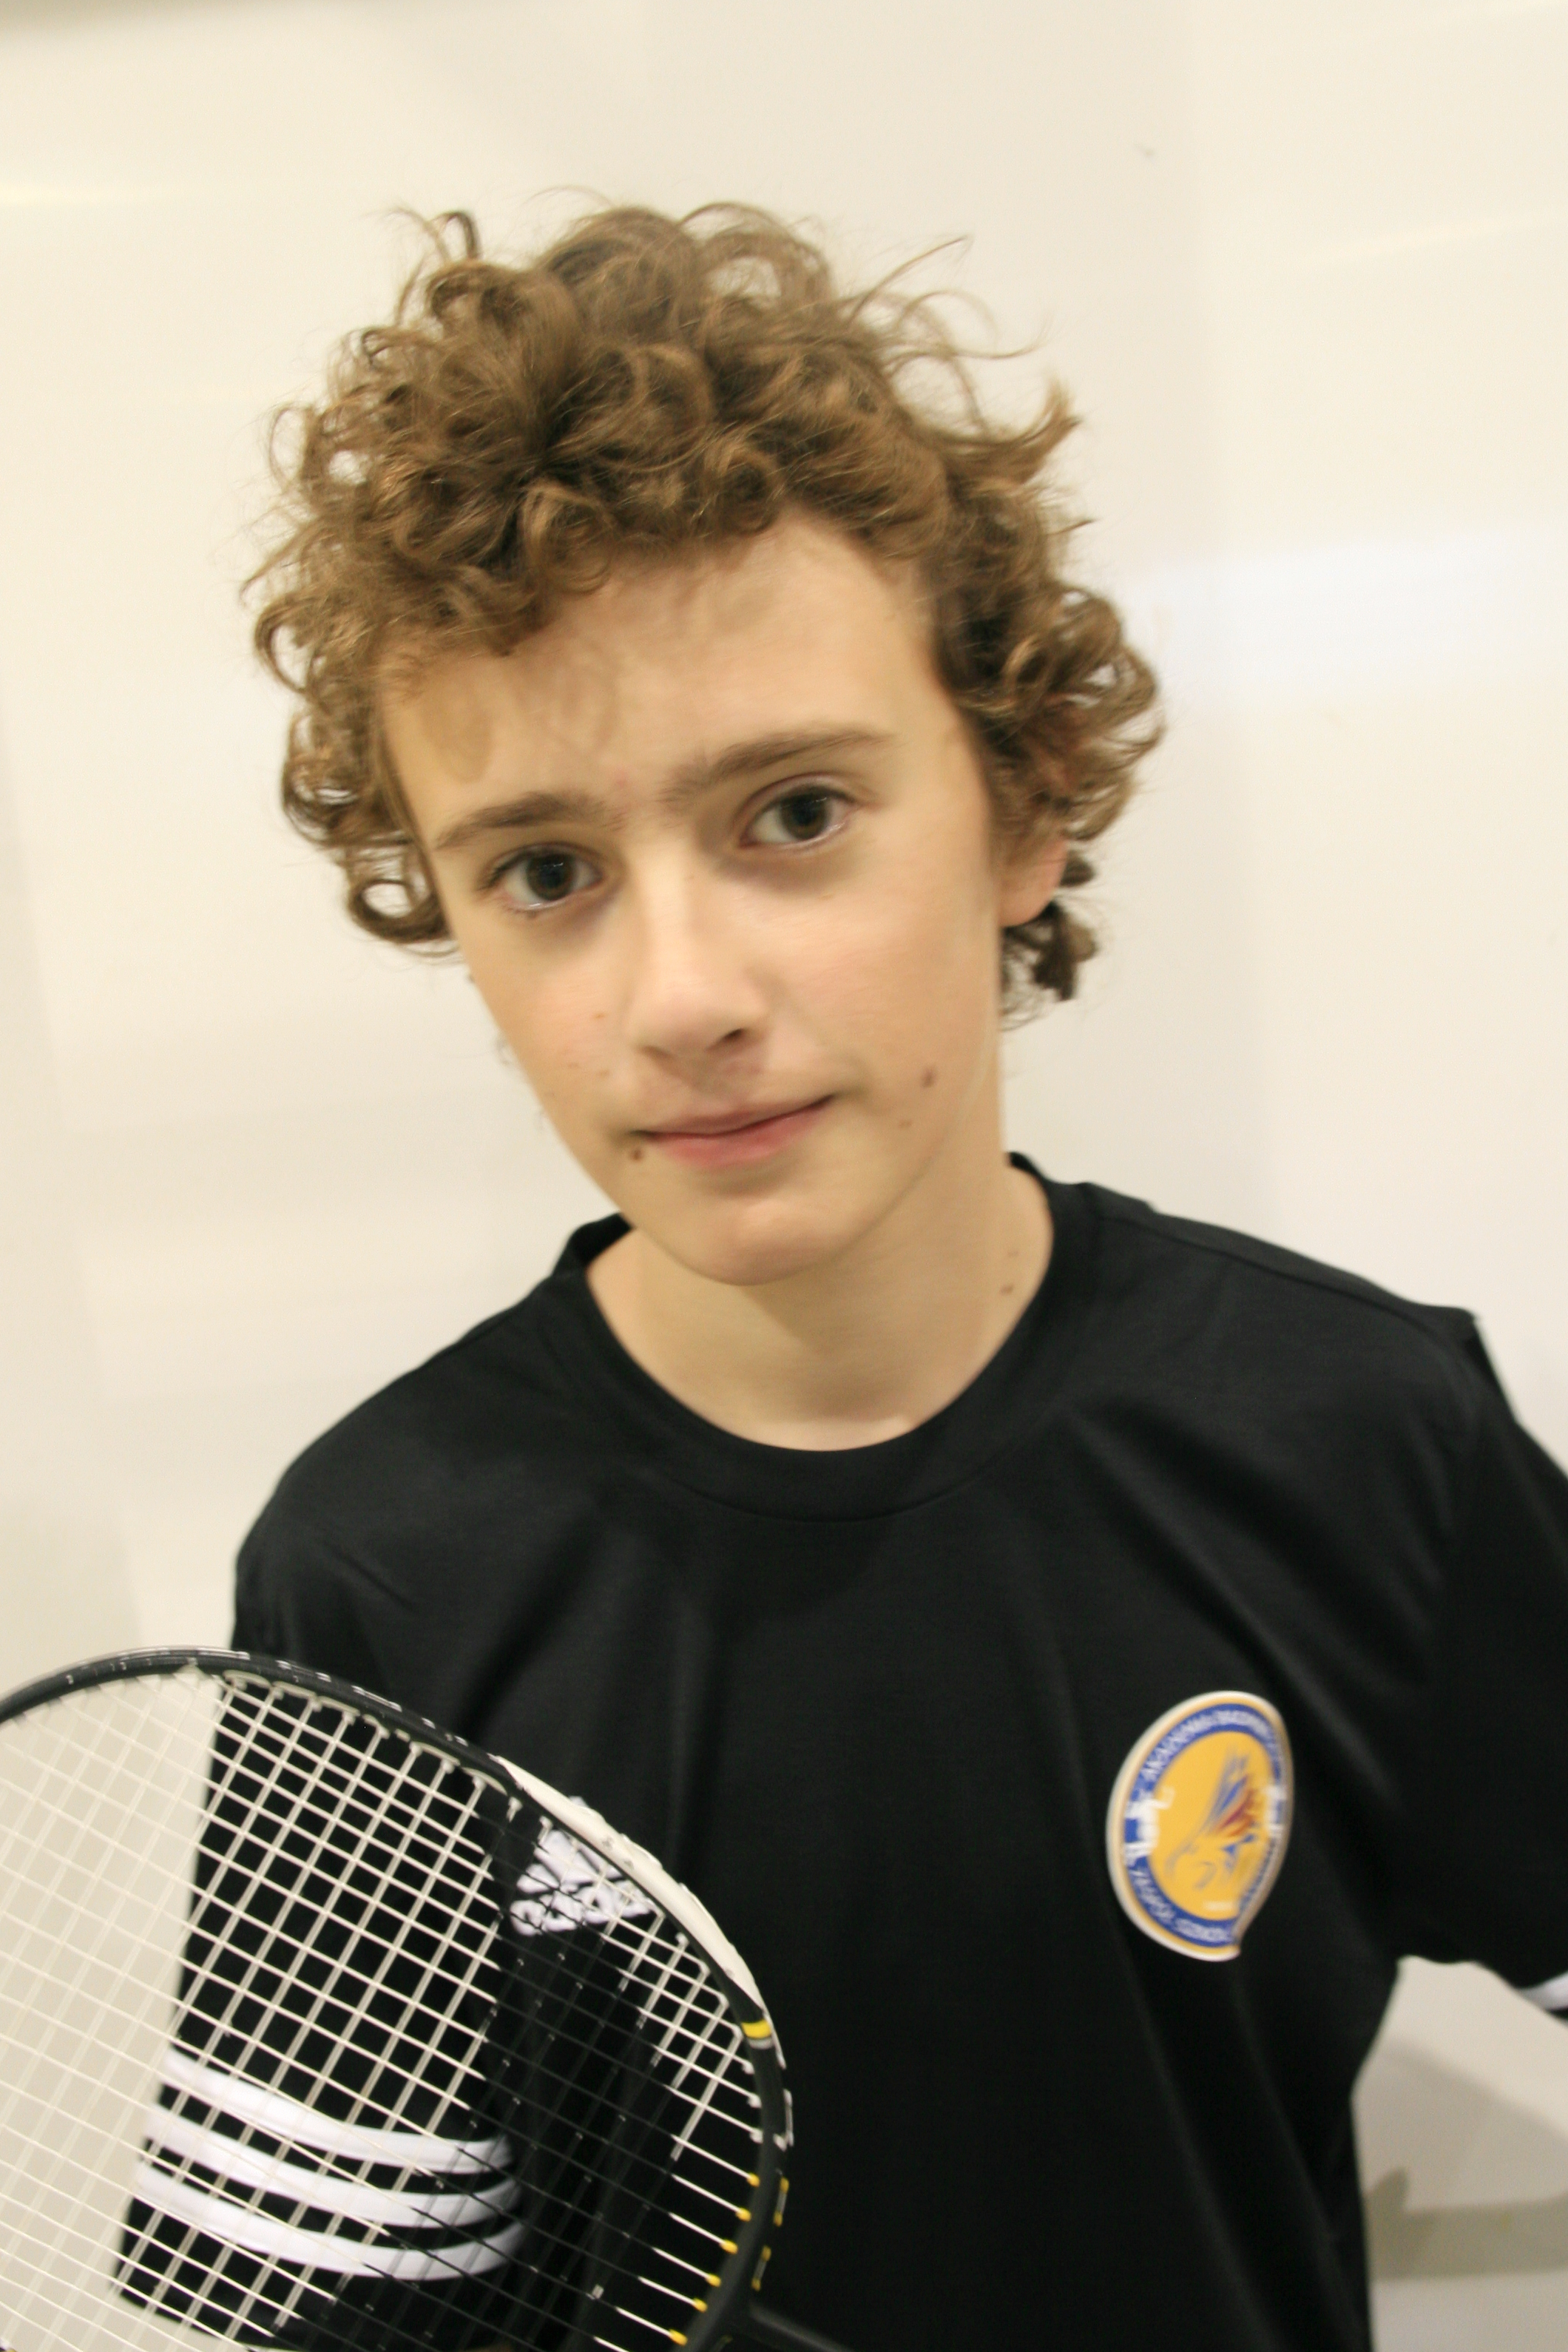 Filip Łukowski